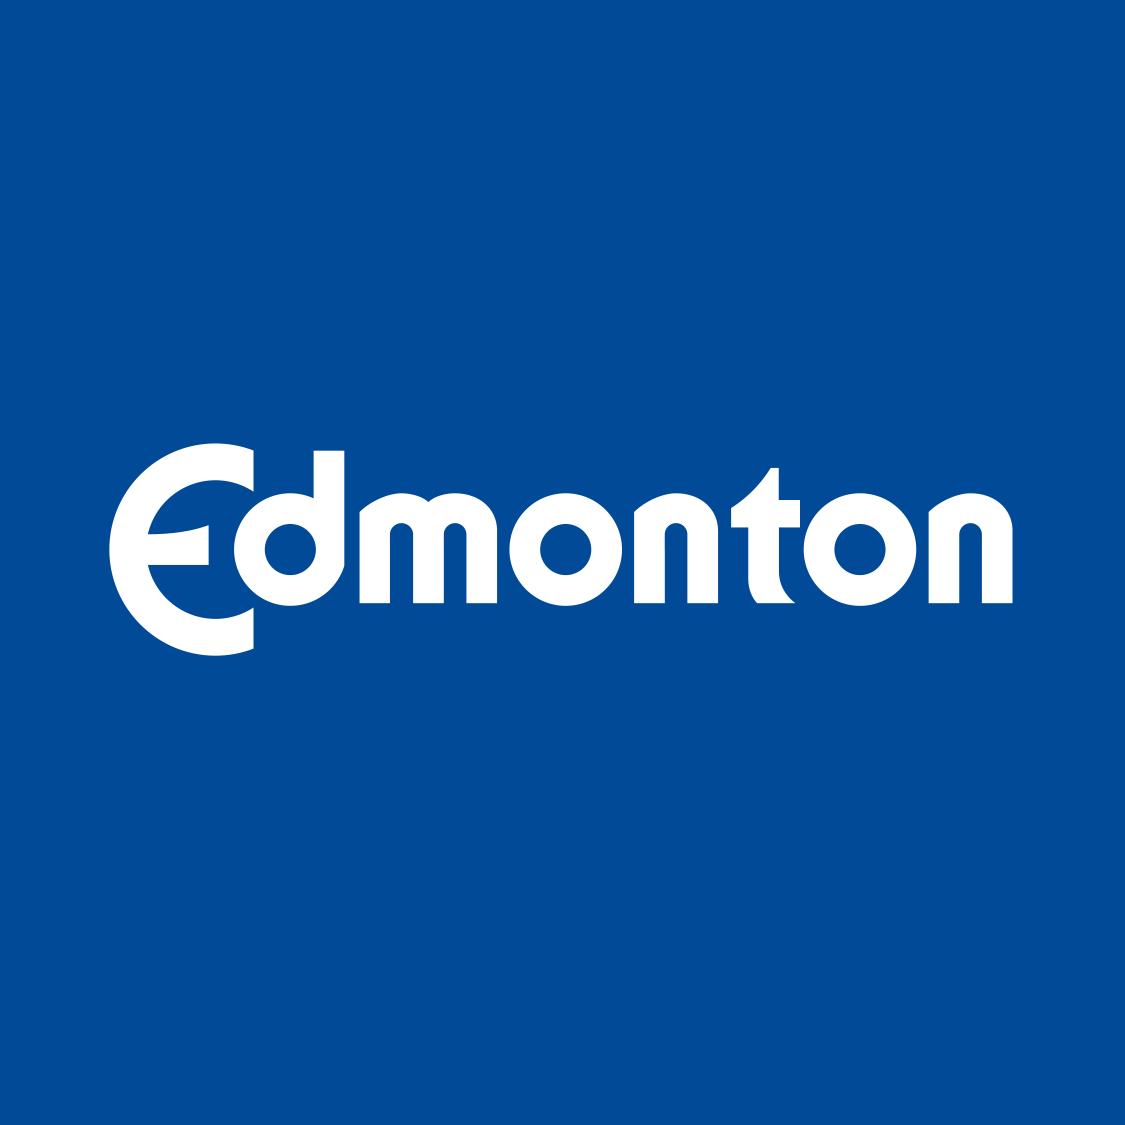 engaged.edmonton.ca